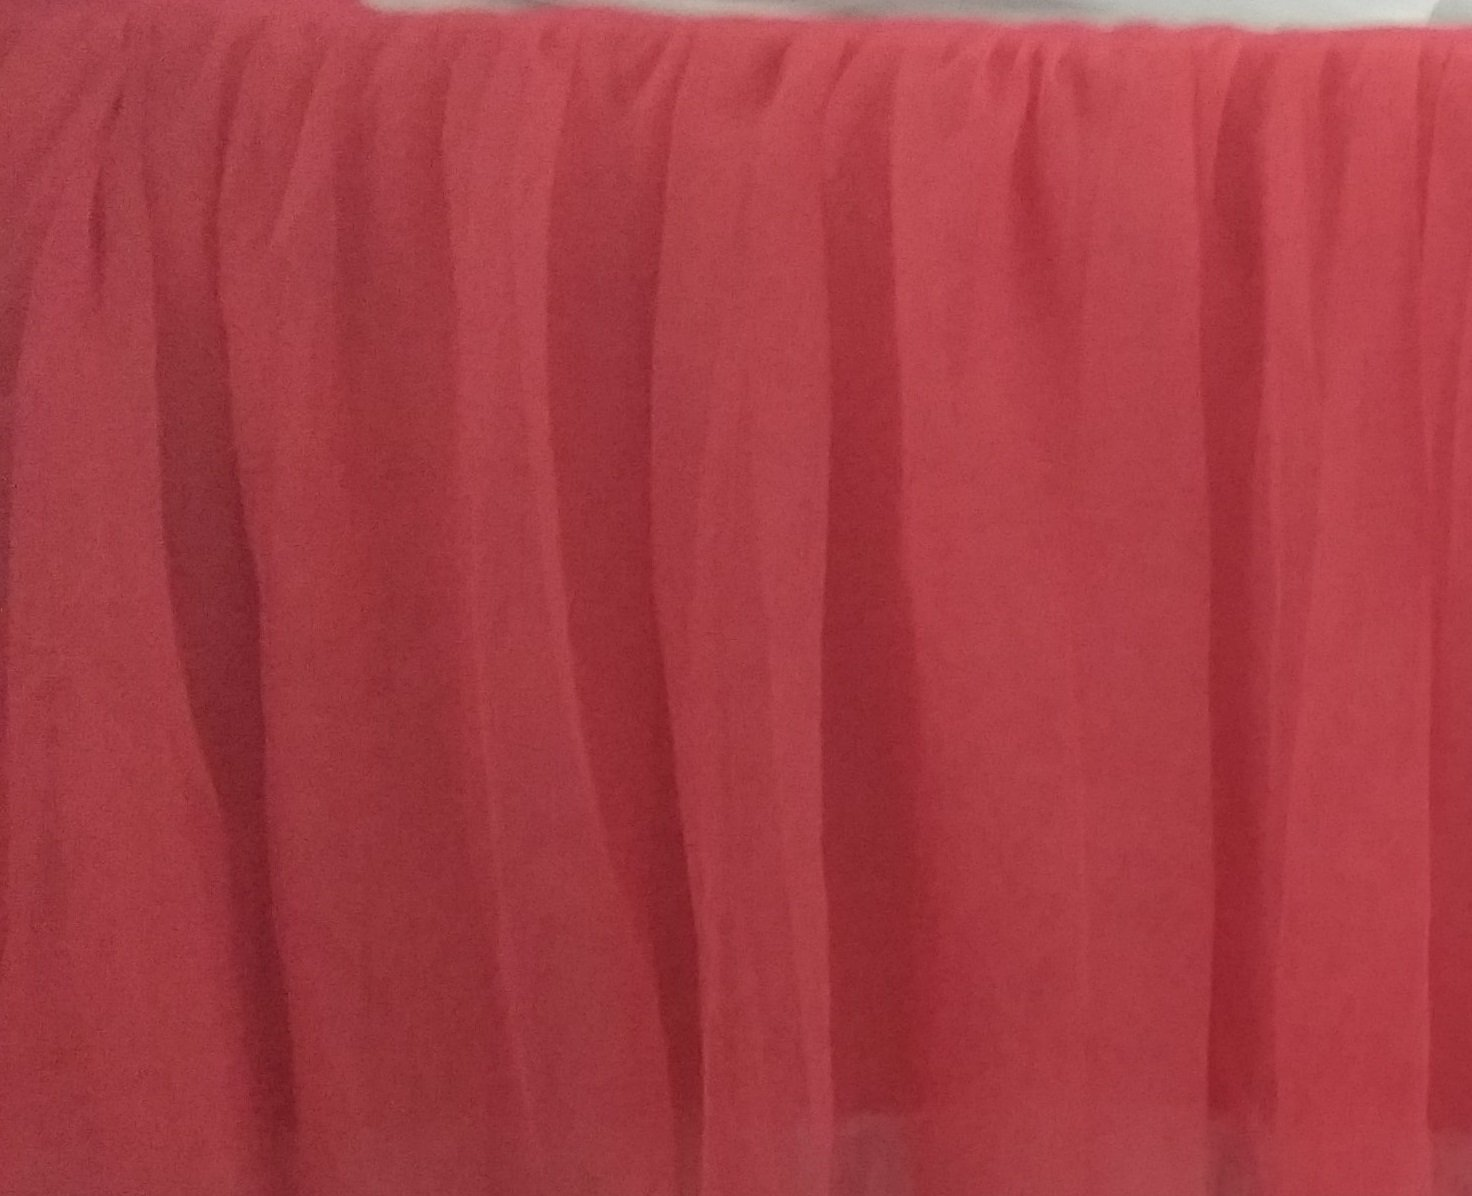 Coral Chiffon Ruffle Lined Crib Skirt 16 Inch Drop 3 Sided